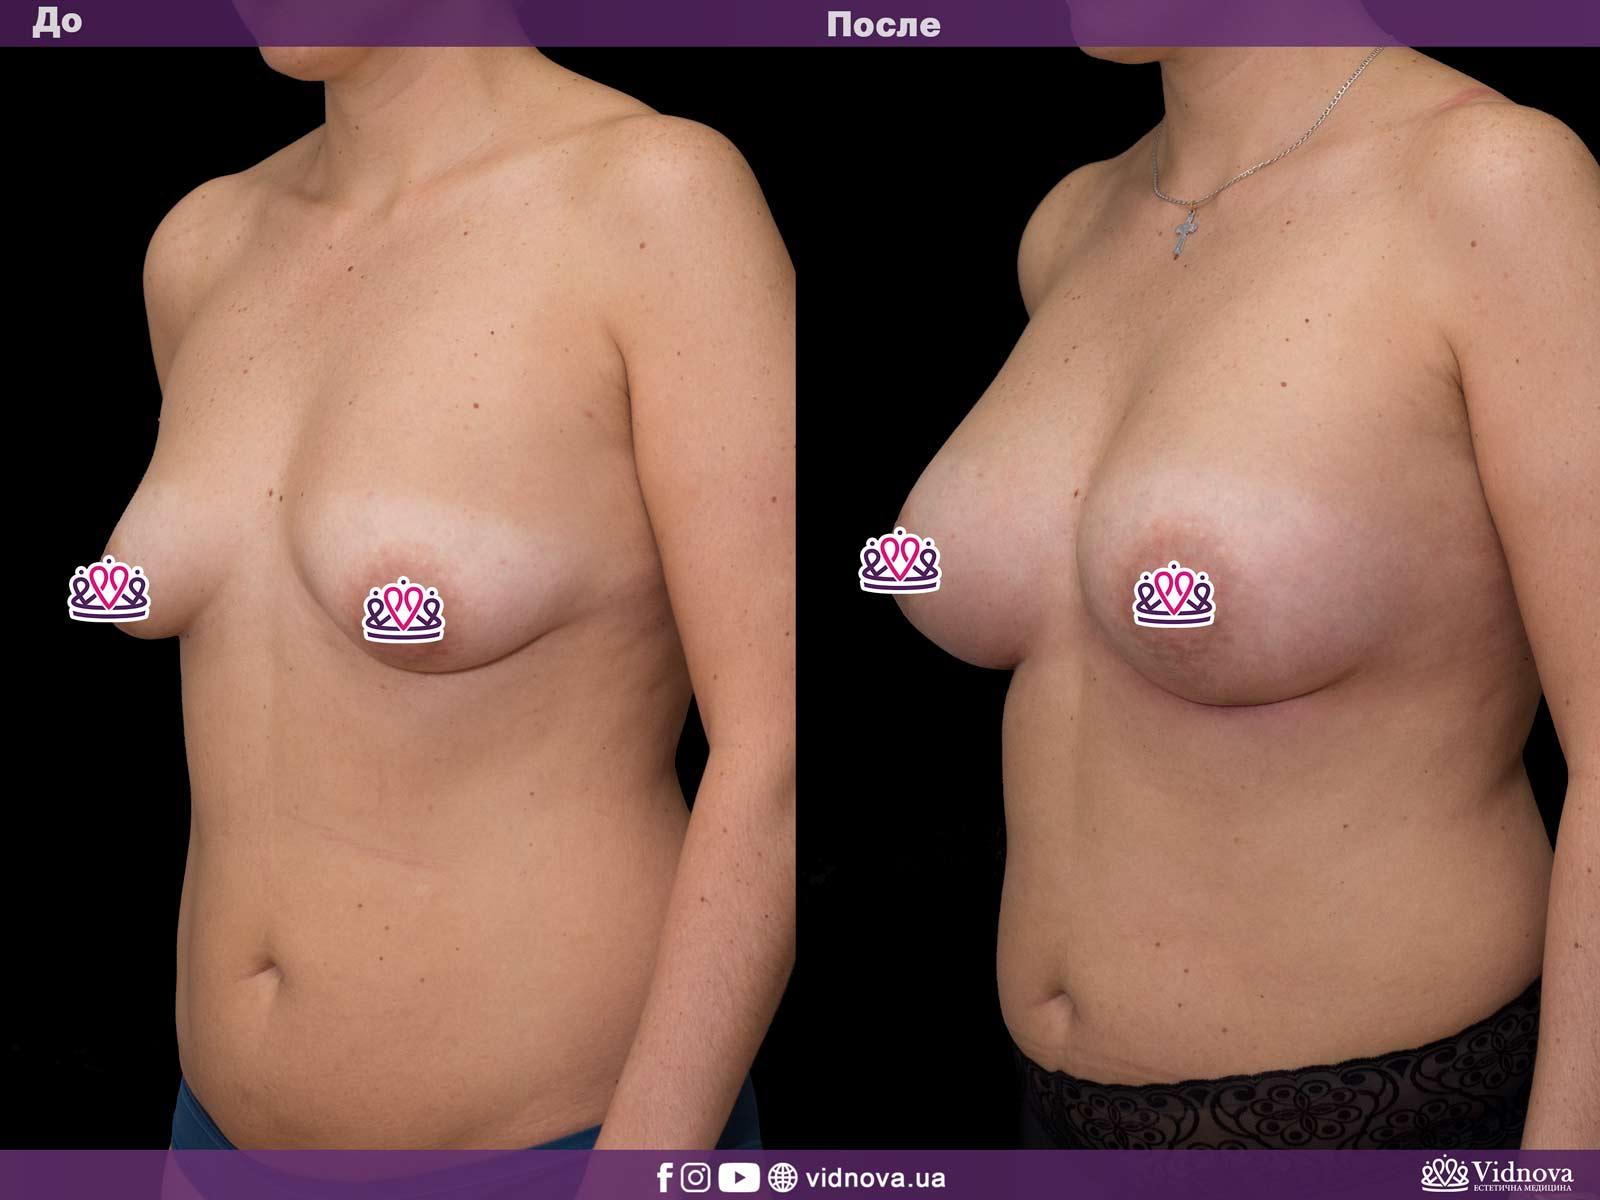 Увеличение груди: Фото ДО и ПОСЛЕ - Пример №31-2 - Клиника Vidnova